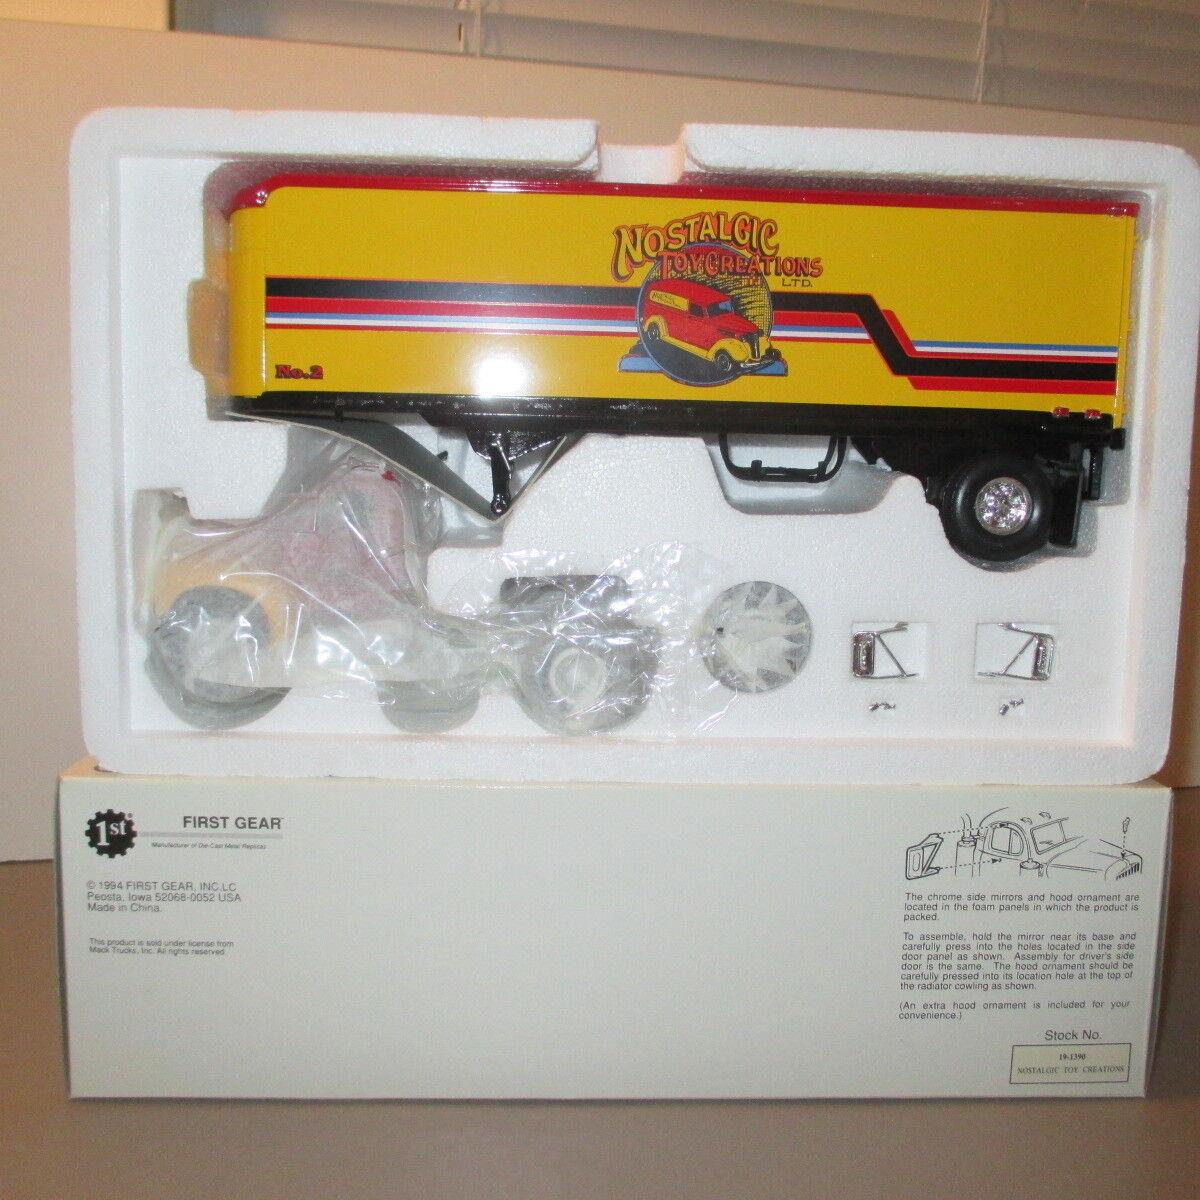 First Gear 1960 Model B 61 Mack Tractor Trailer Nostalgic Toy Hotwheels Vw Drag Bus Mnm Rare Norton Secured Powered By Verisign